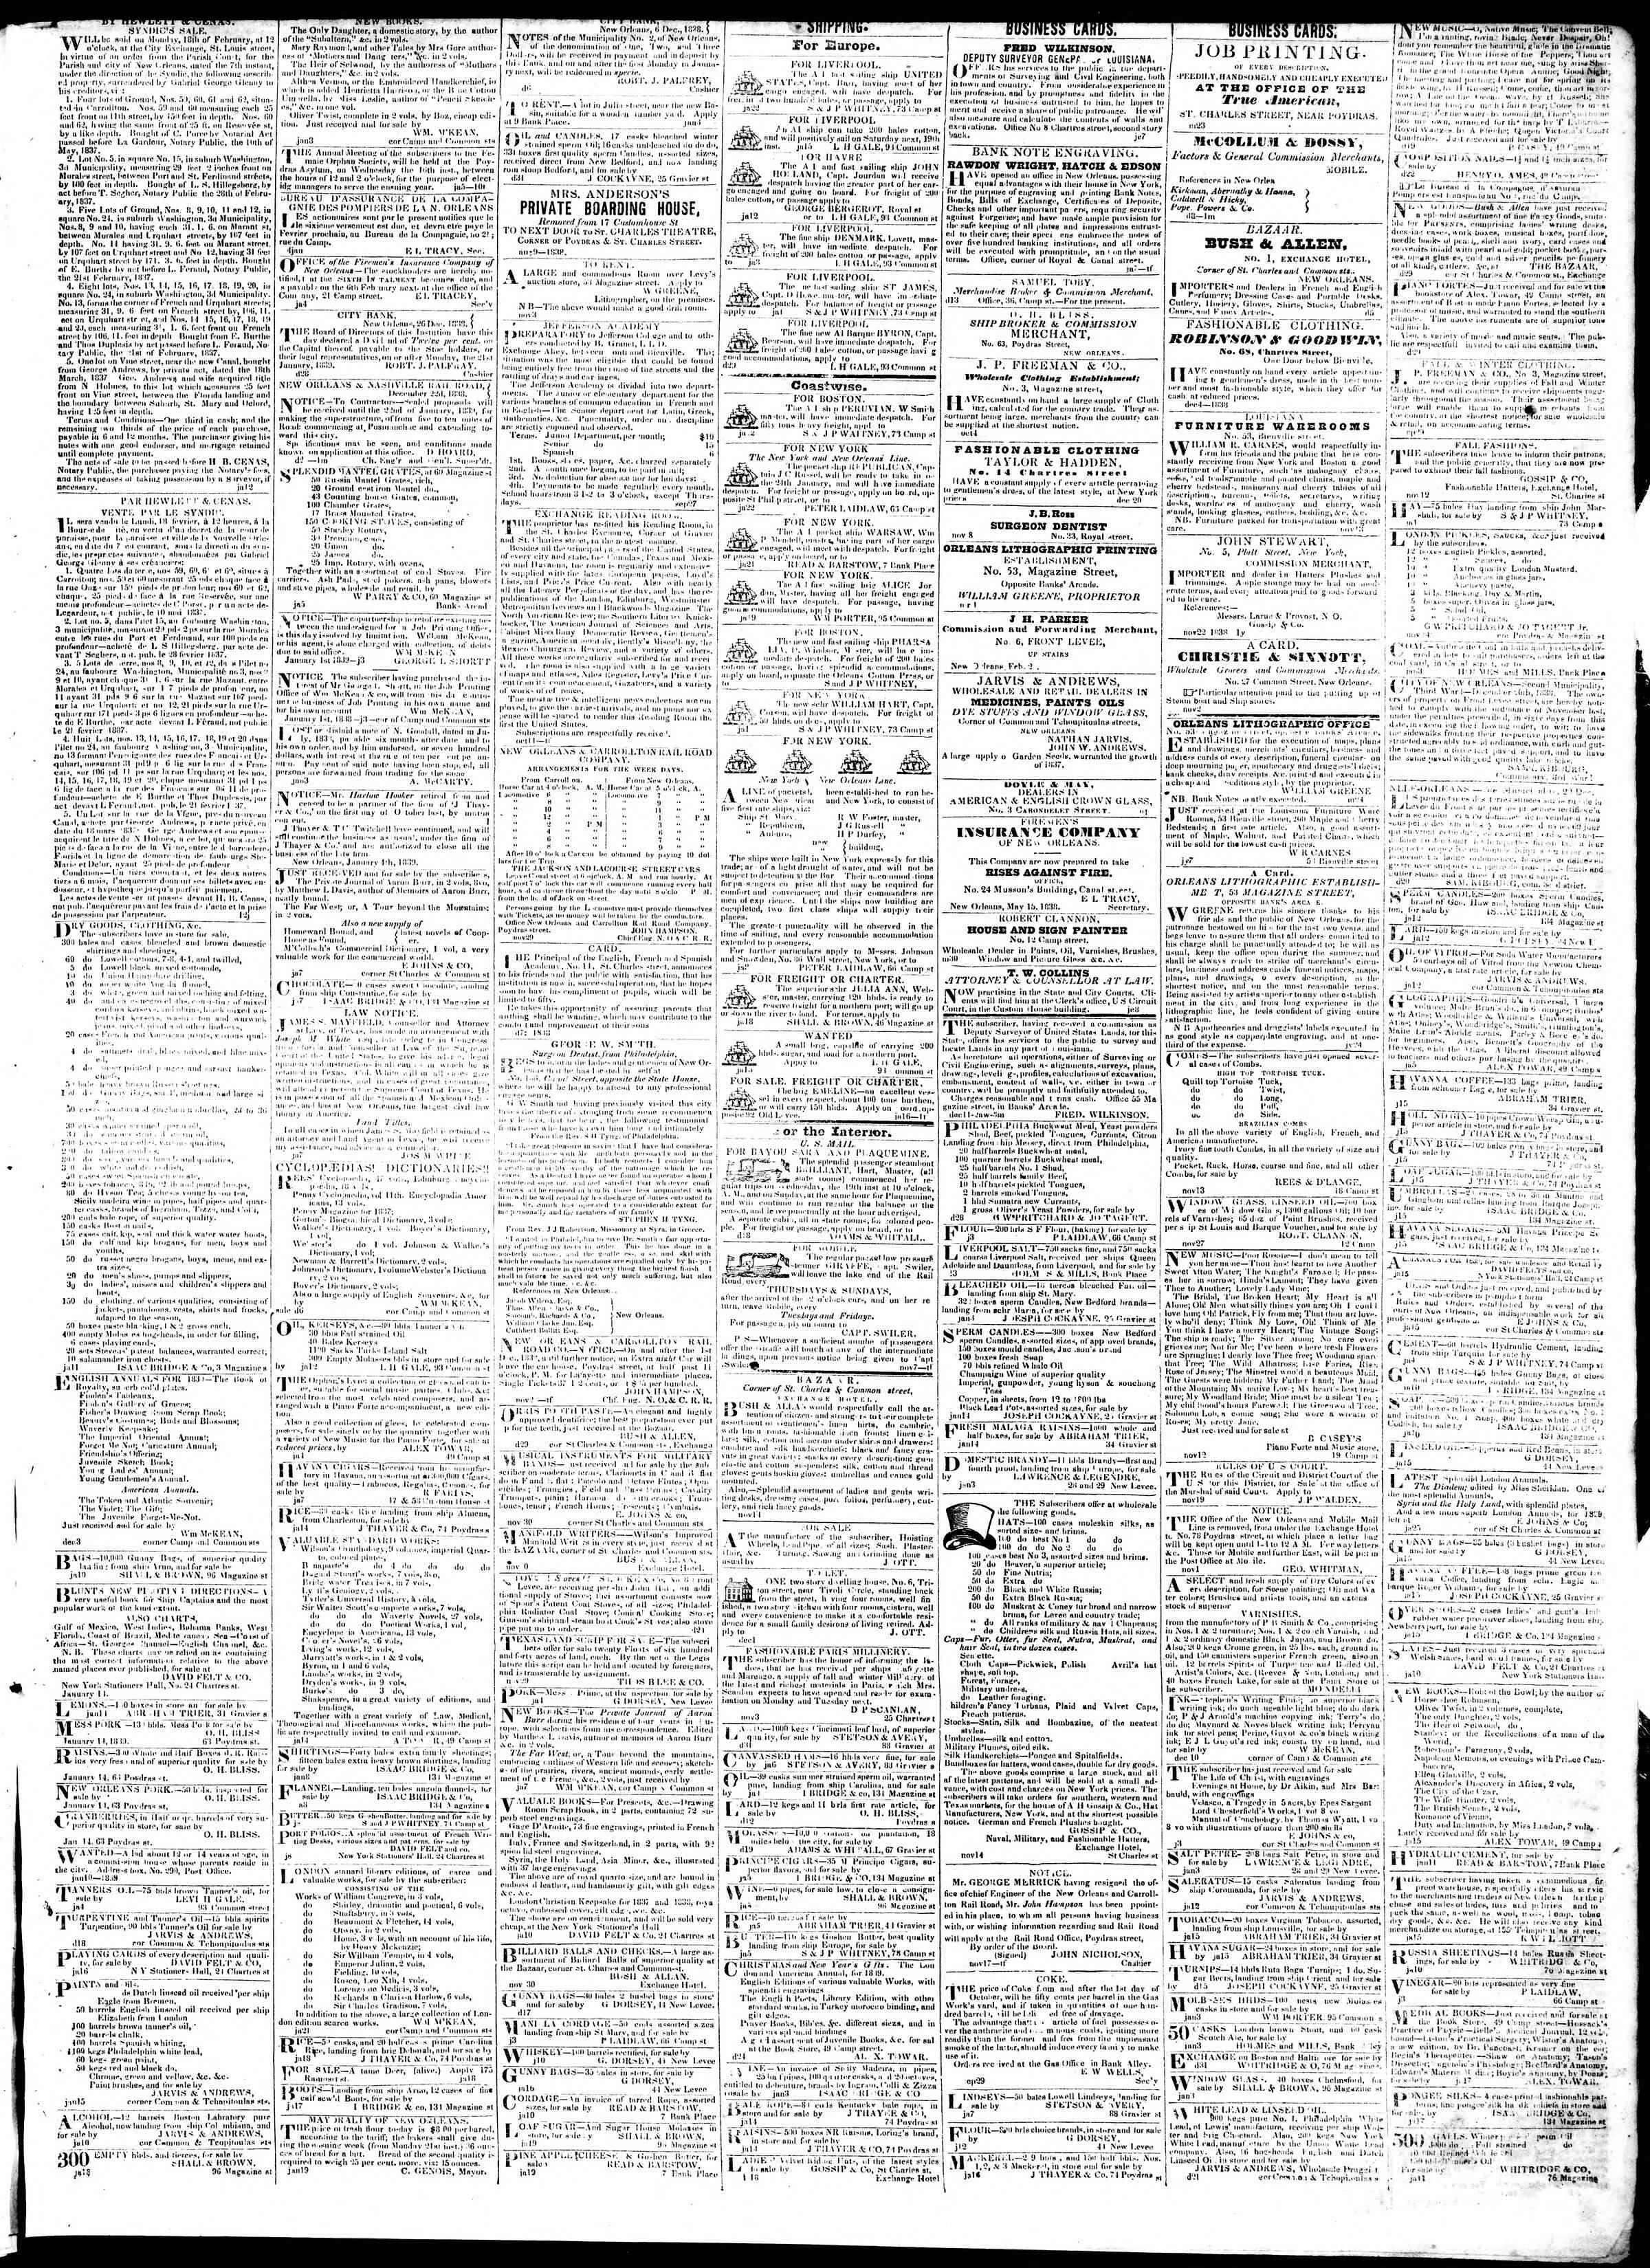 January 24, 1839 Tarihli True American Gazetesi Sayfa 3